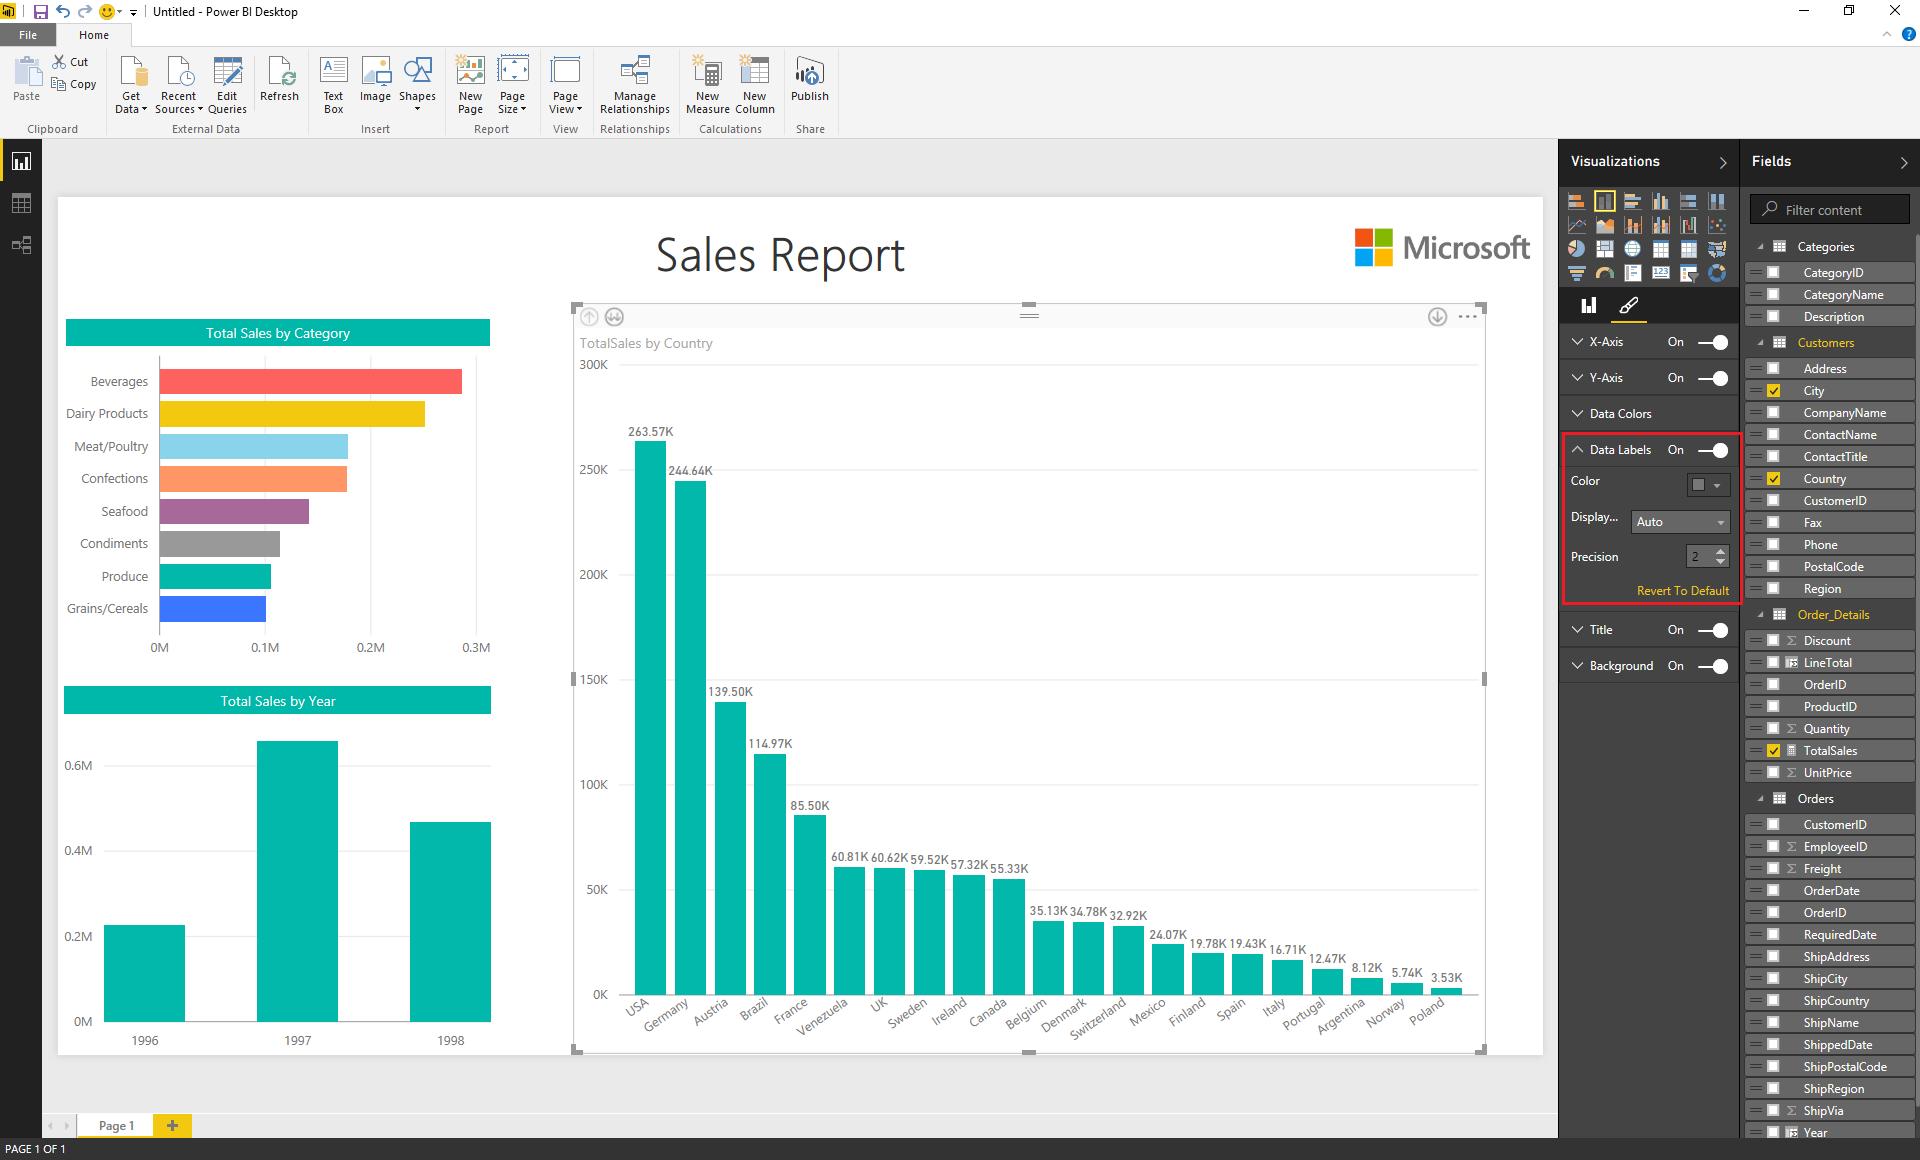 44 New Features In The Power Bi Desktop September Update Microsoft